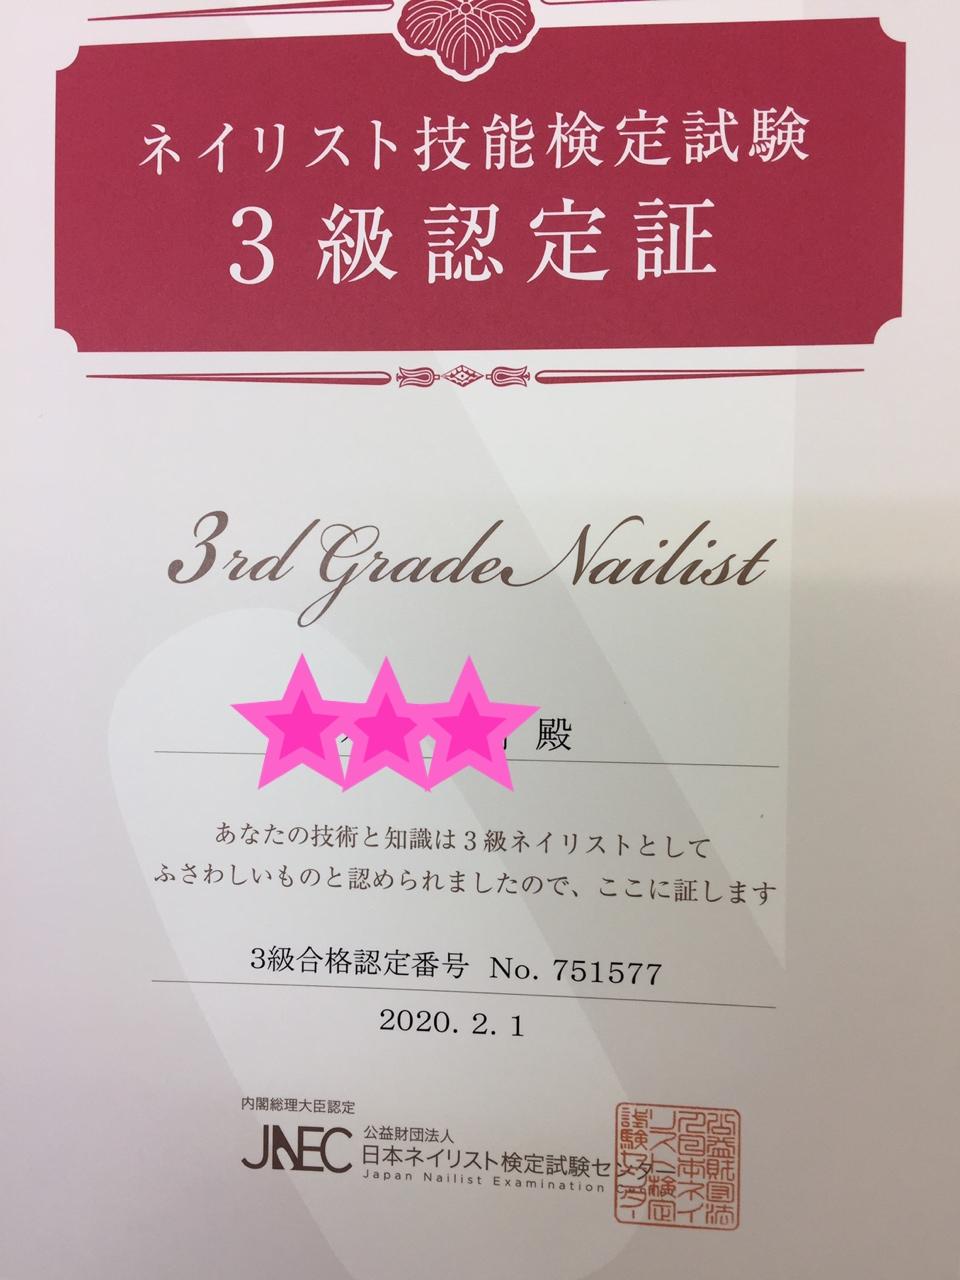 BF1490B9-A458-4E7E-B78A-0C4163E76E19